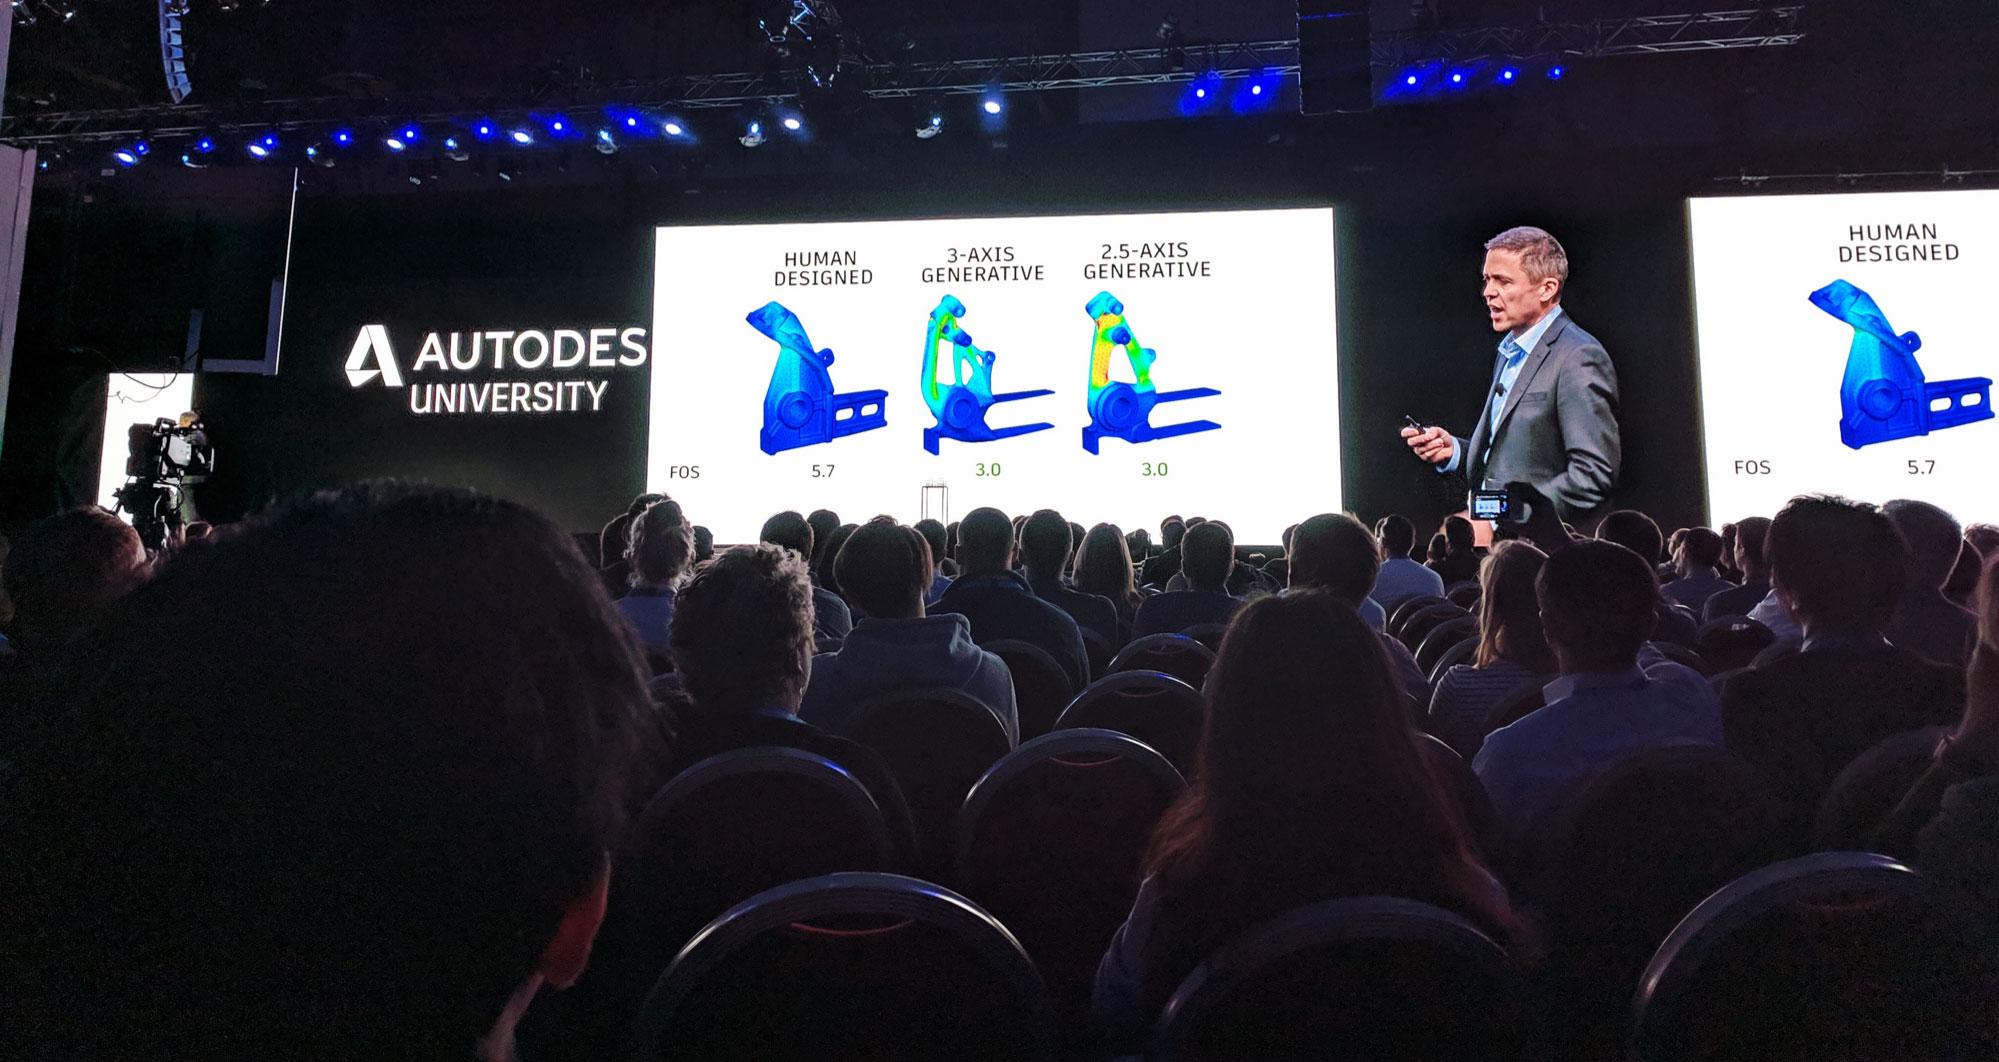 Autodesk University Manufacturing Keynote